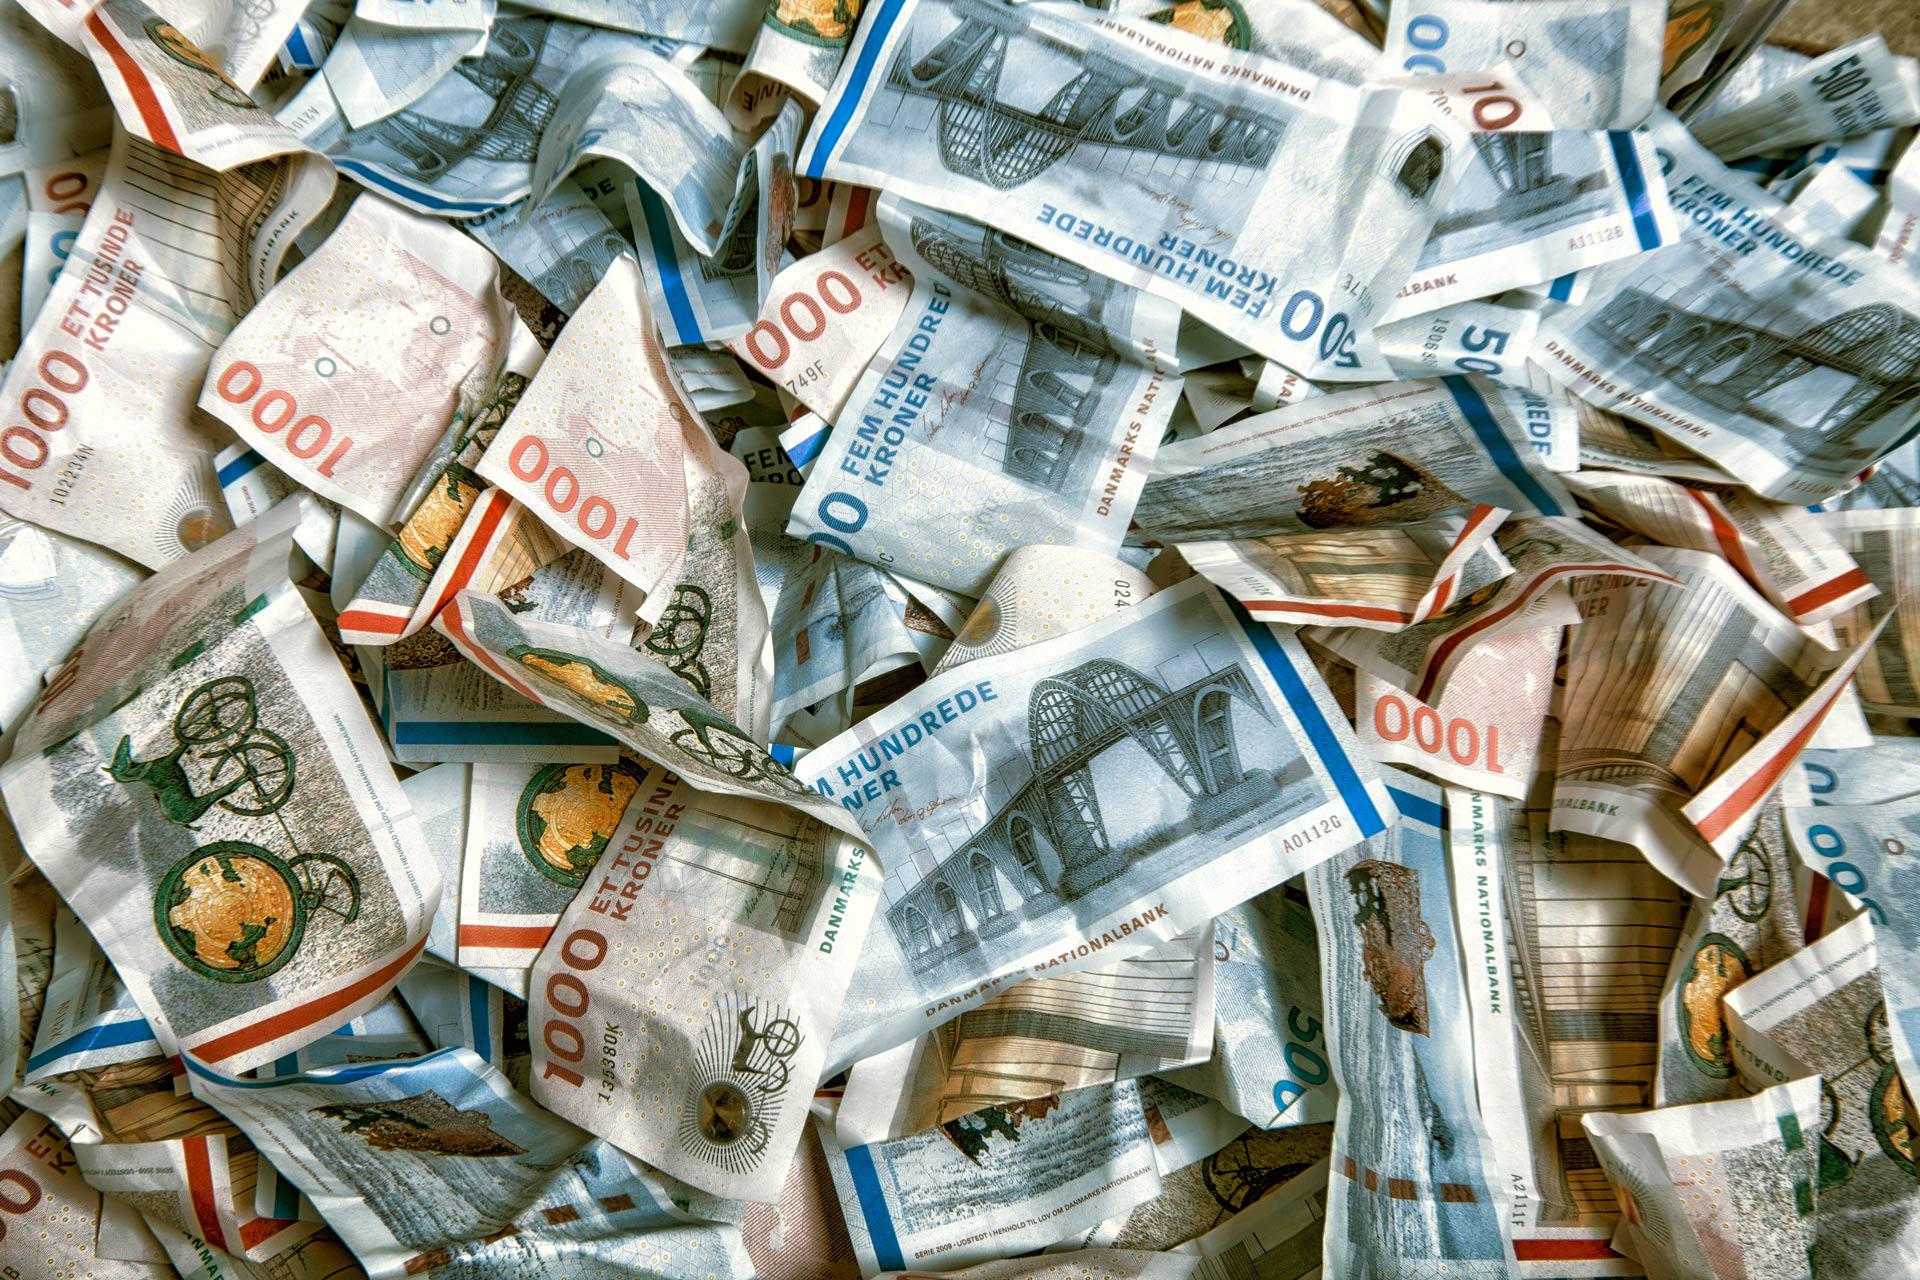 pengesedel, lån, renter, nationalbanken, husleje